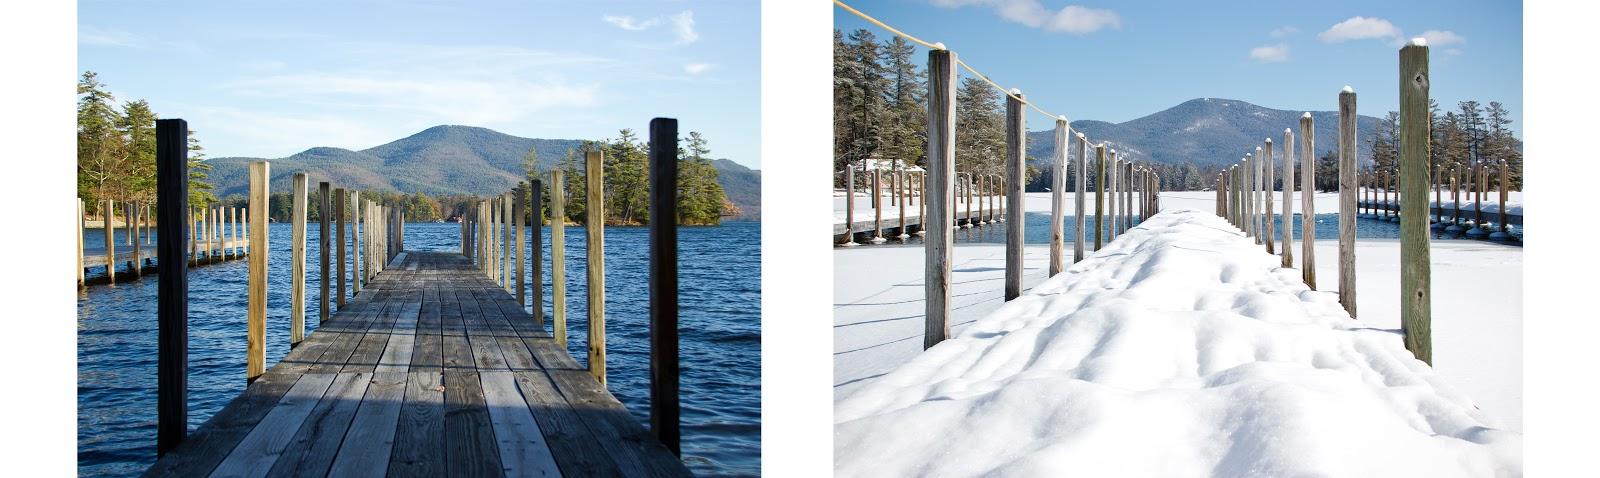 Nicole Sgroi Lake George photographs